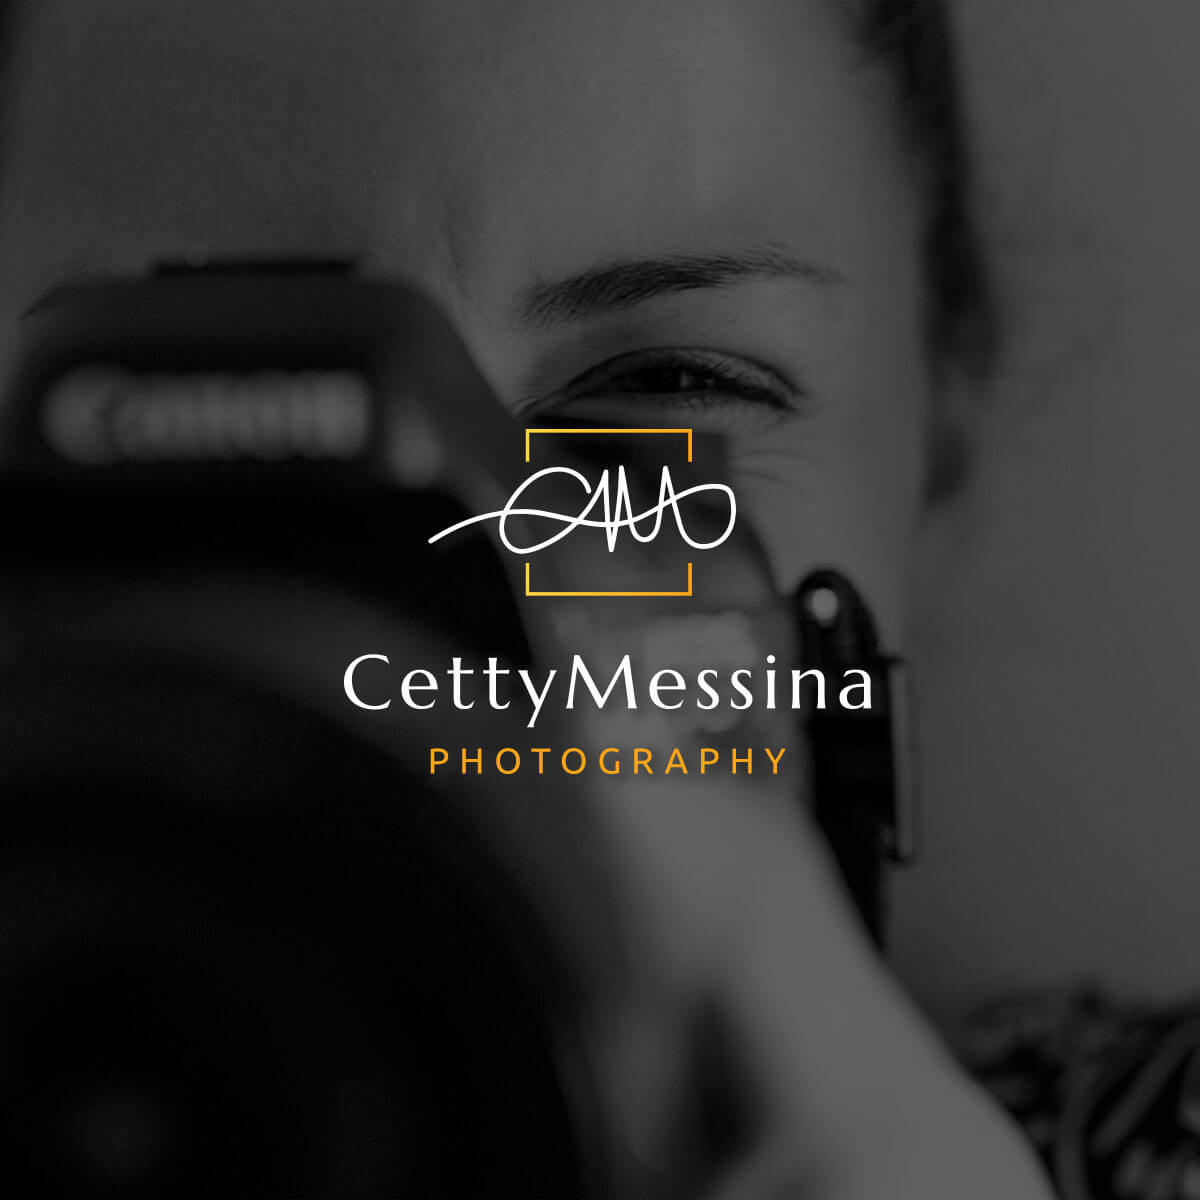 cetty messina ph